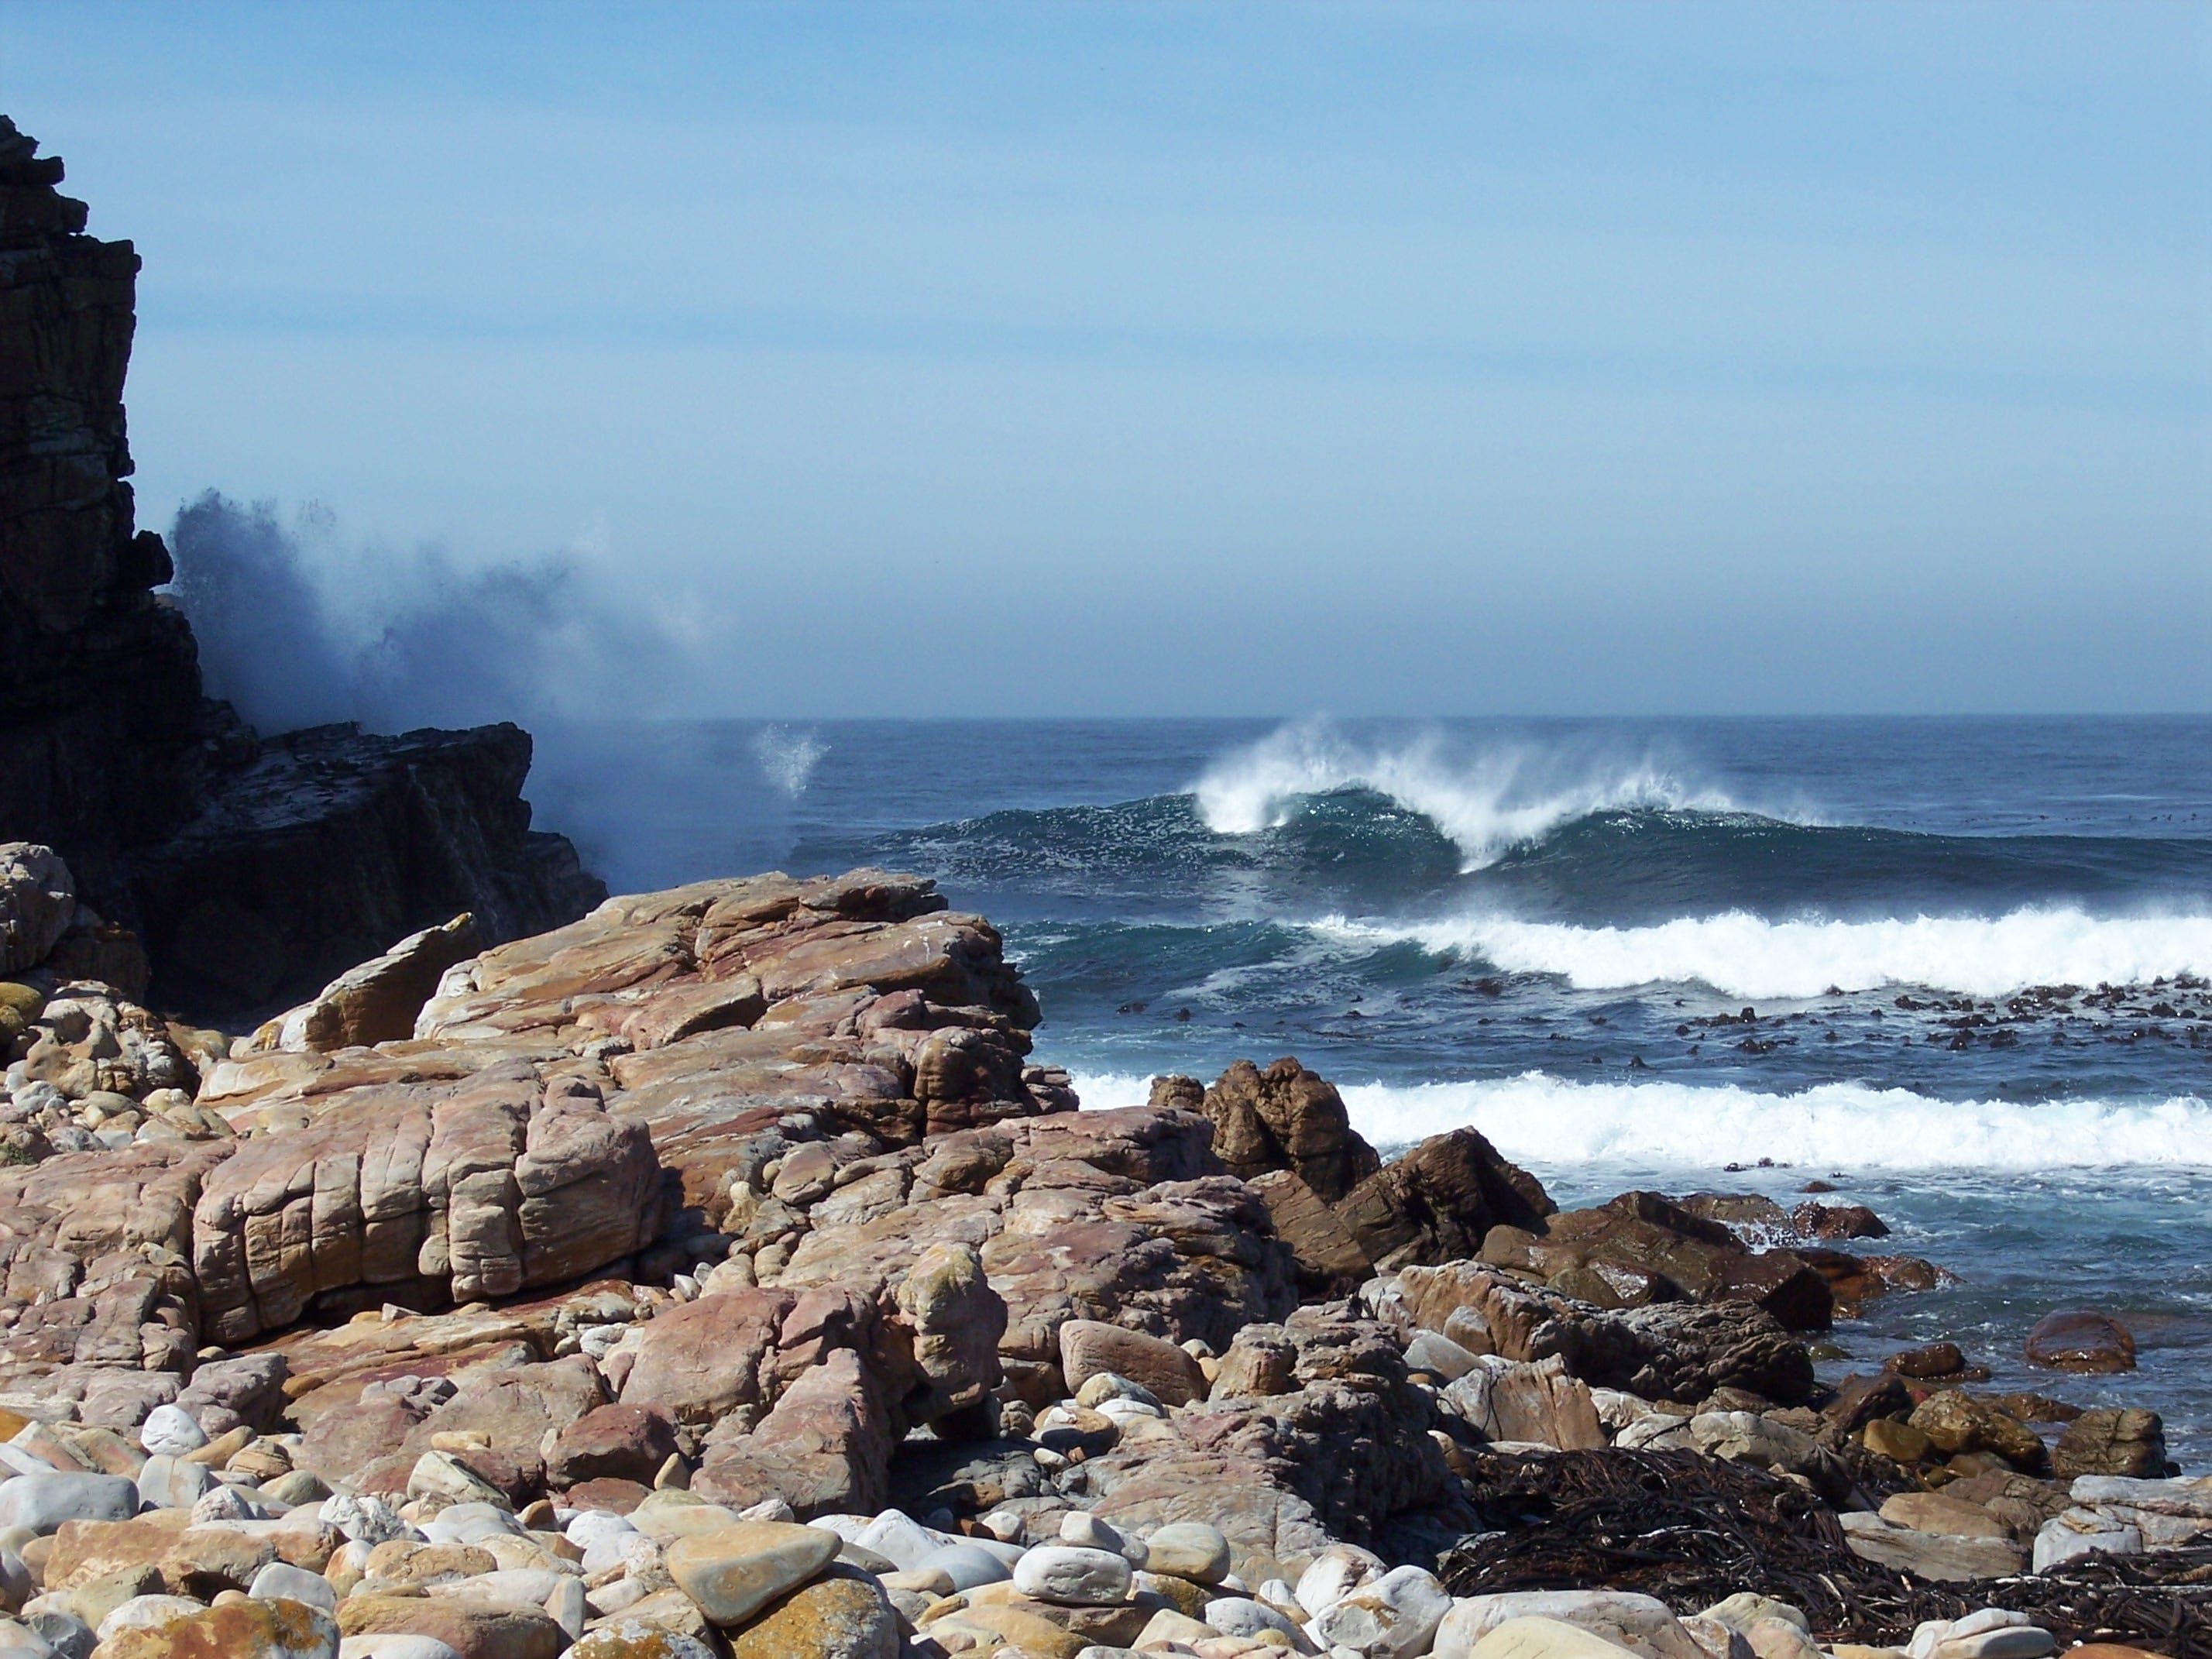 Wave Splashing on Rock Shore